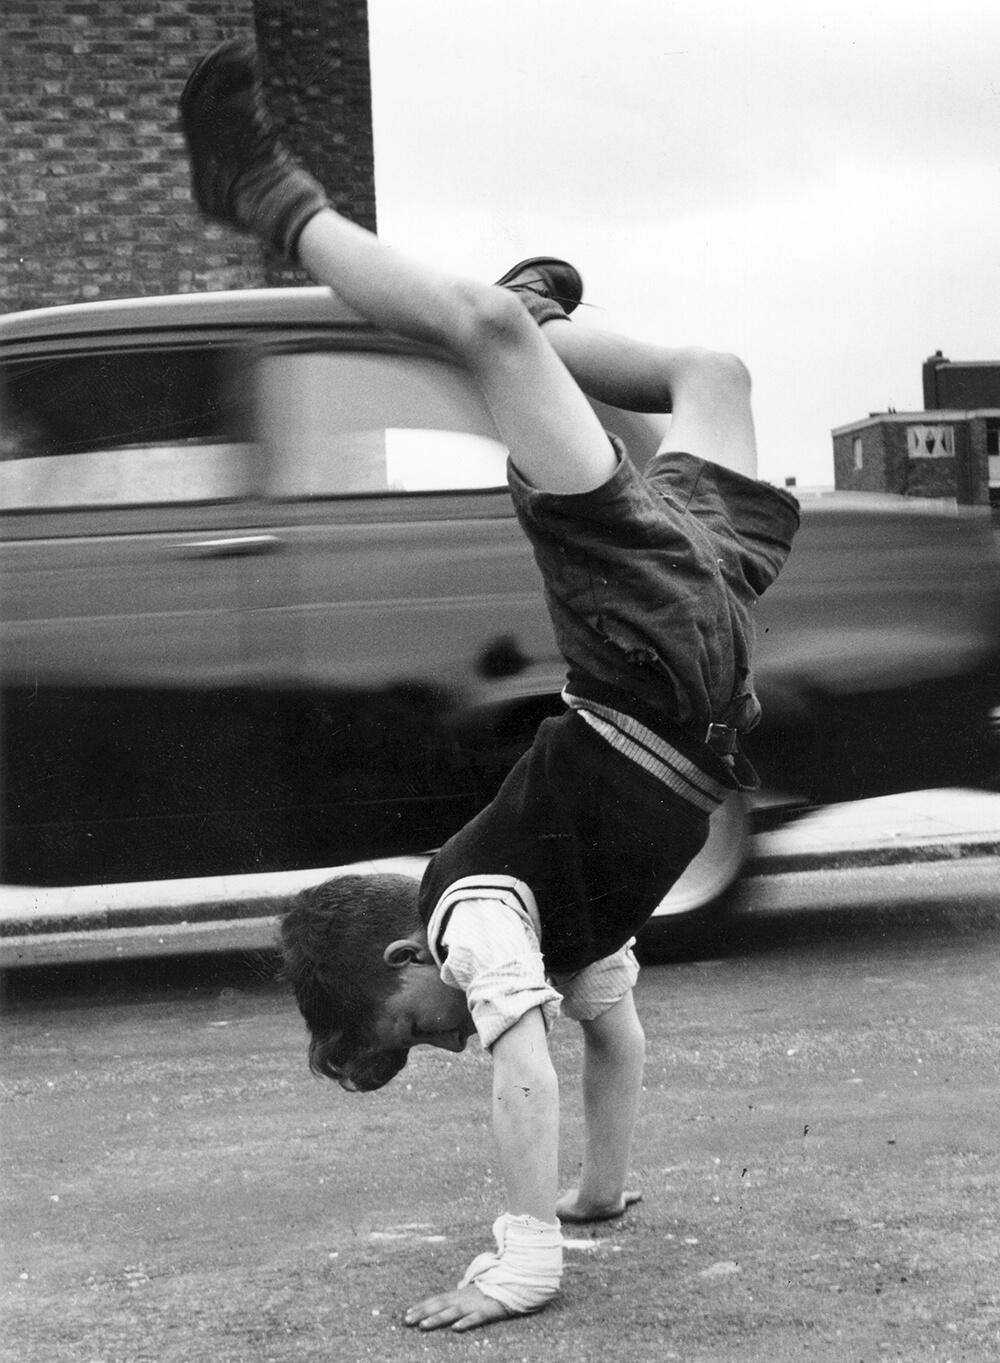 Handstand fine art photography